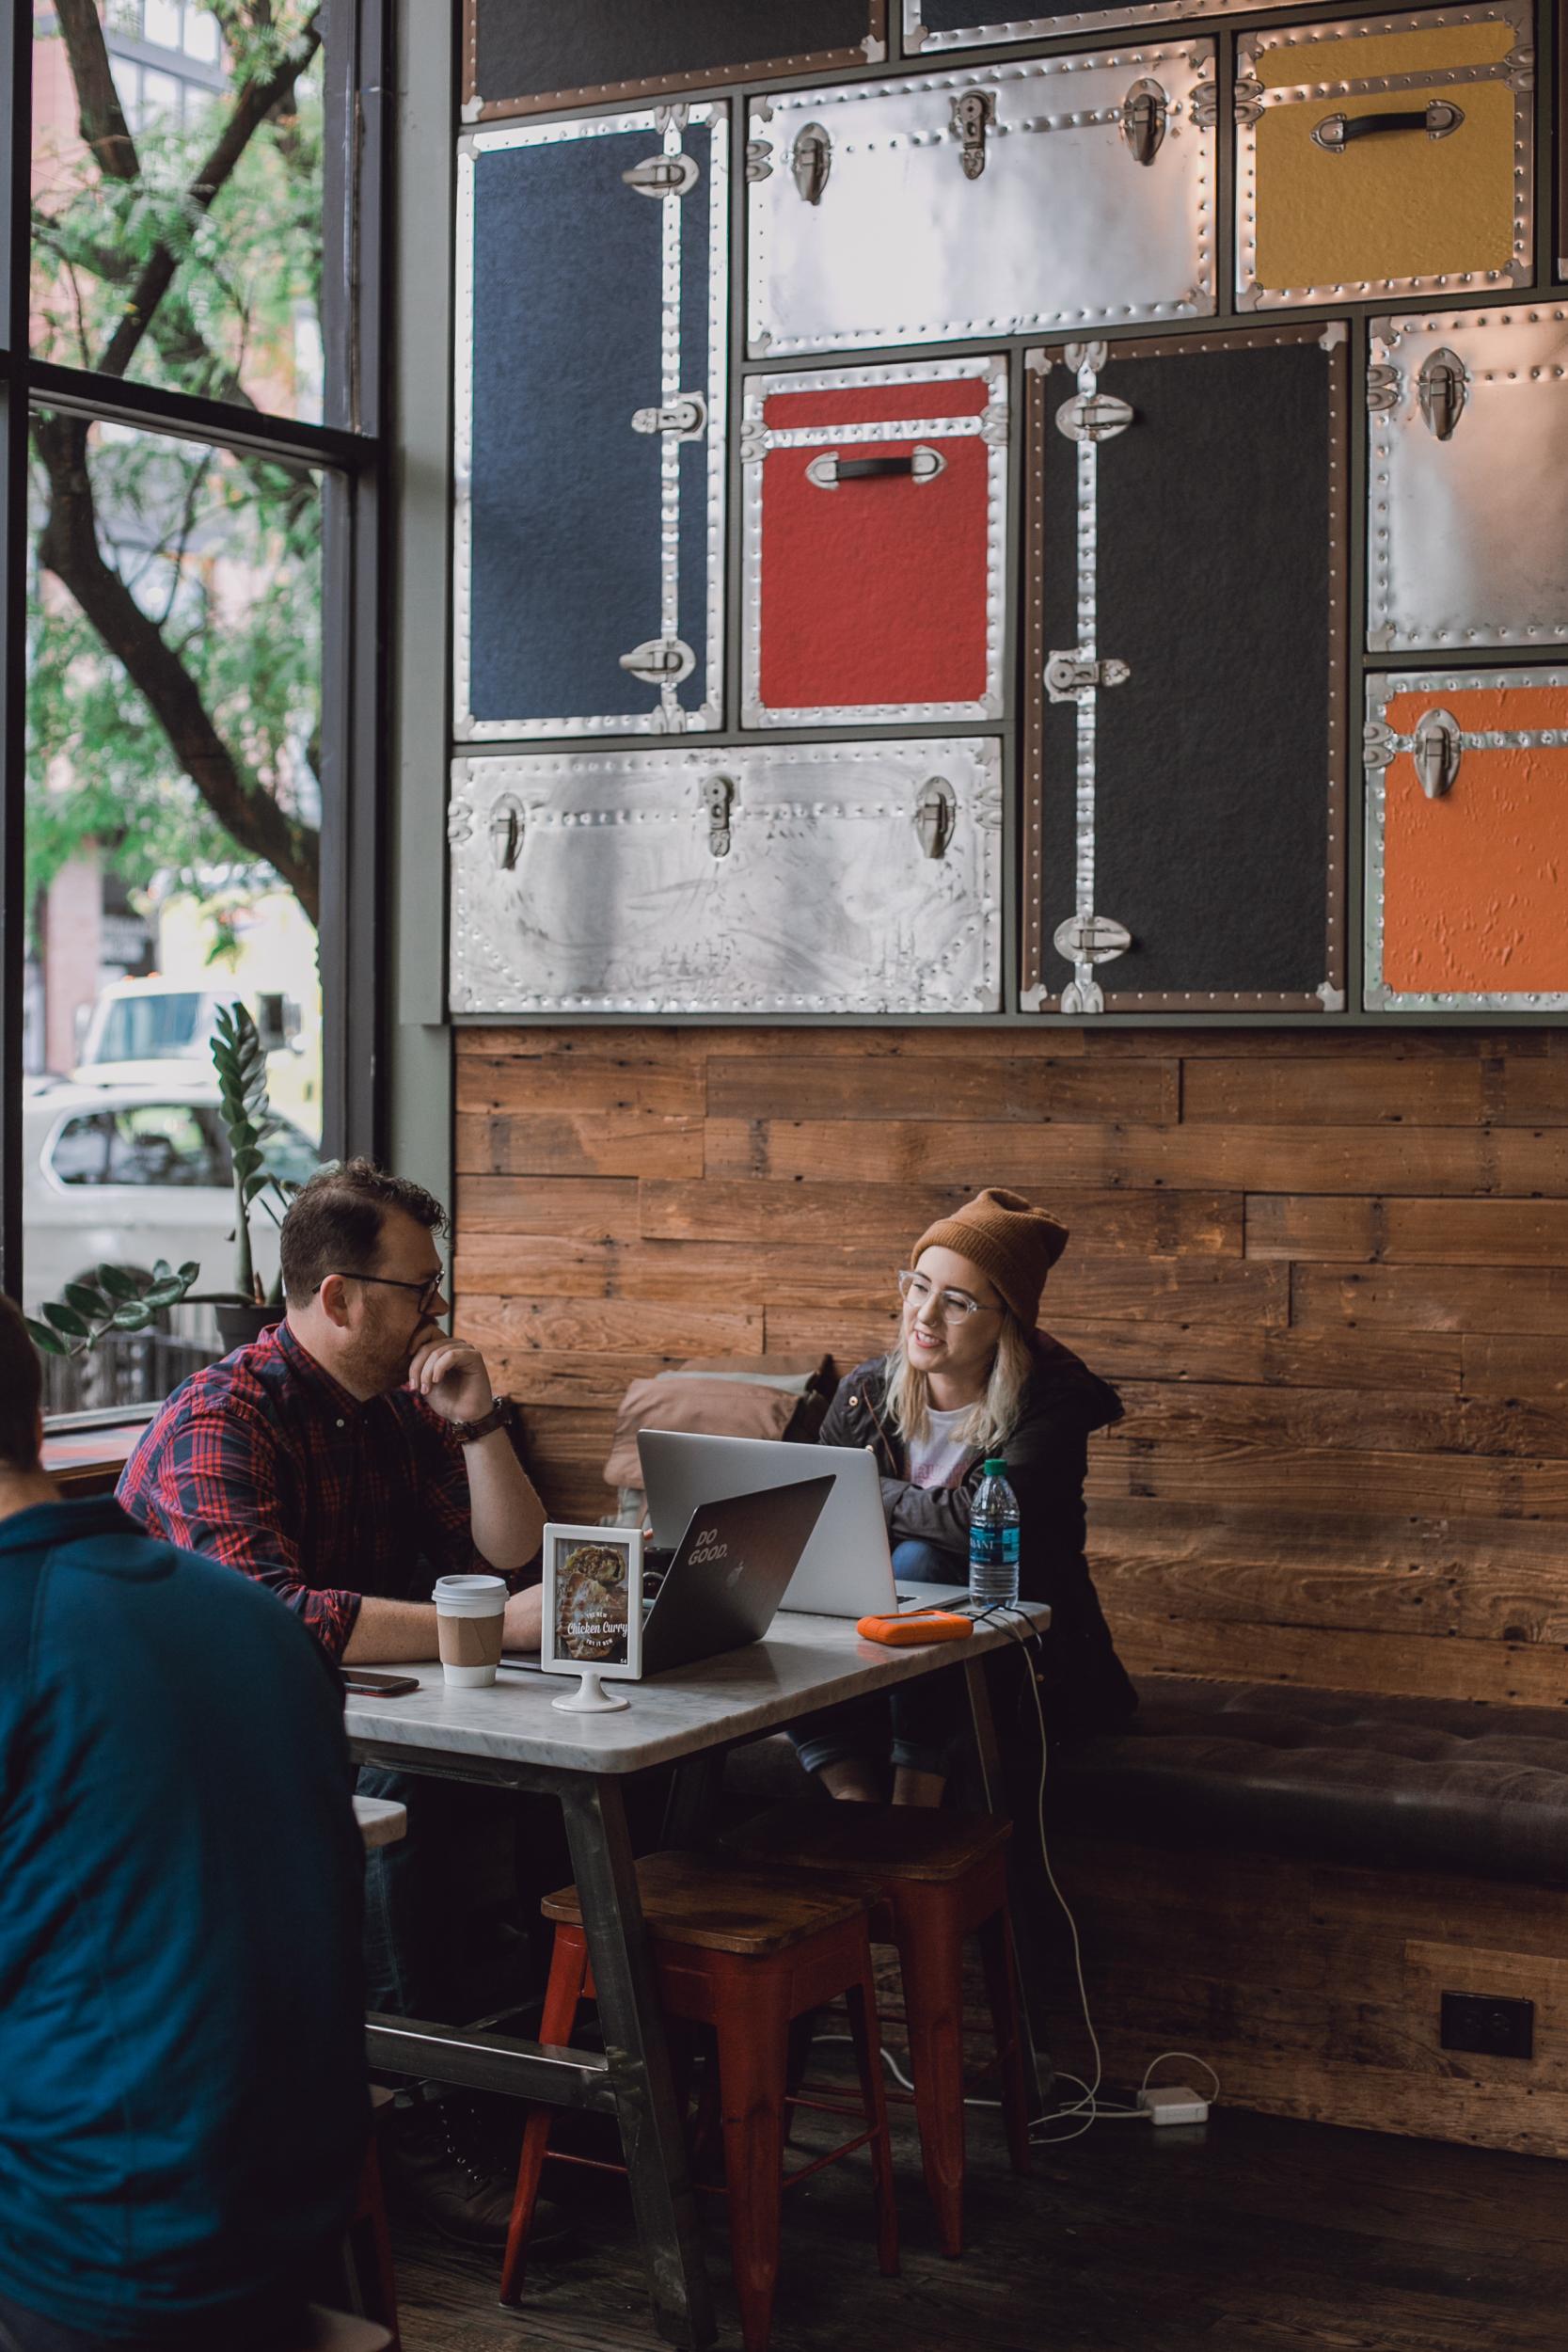 5411 Empanadas, 5411 Empanadas Wicker Park Chicago Illinois, Chicago Hostel, Chicago Illinois, Chicago Illinois Travel Guide, Holiday Jones Hostel, Wicker Park-www.rachelsmak.com29.jpg